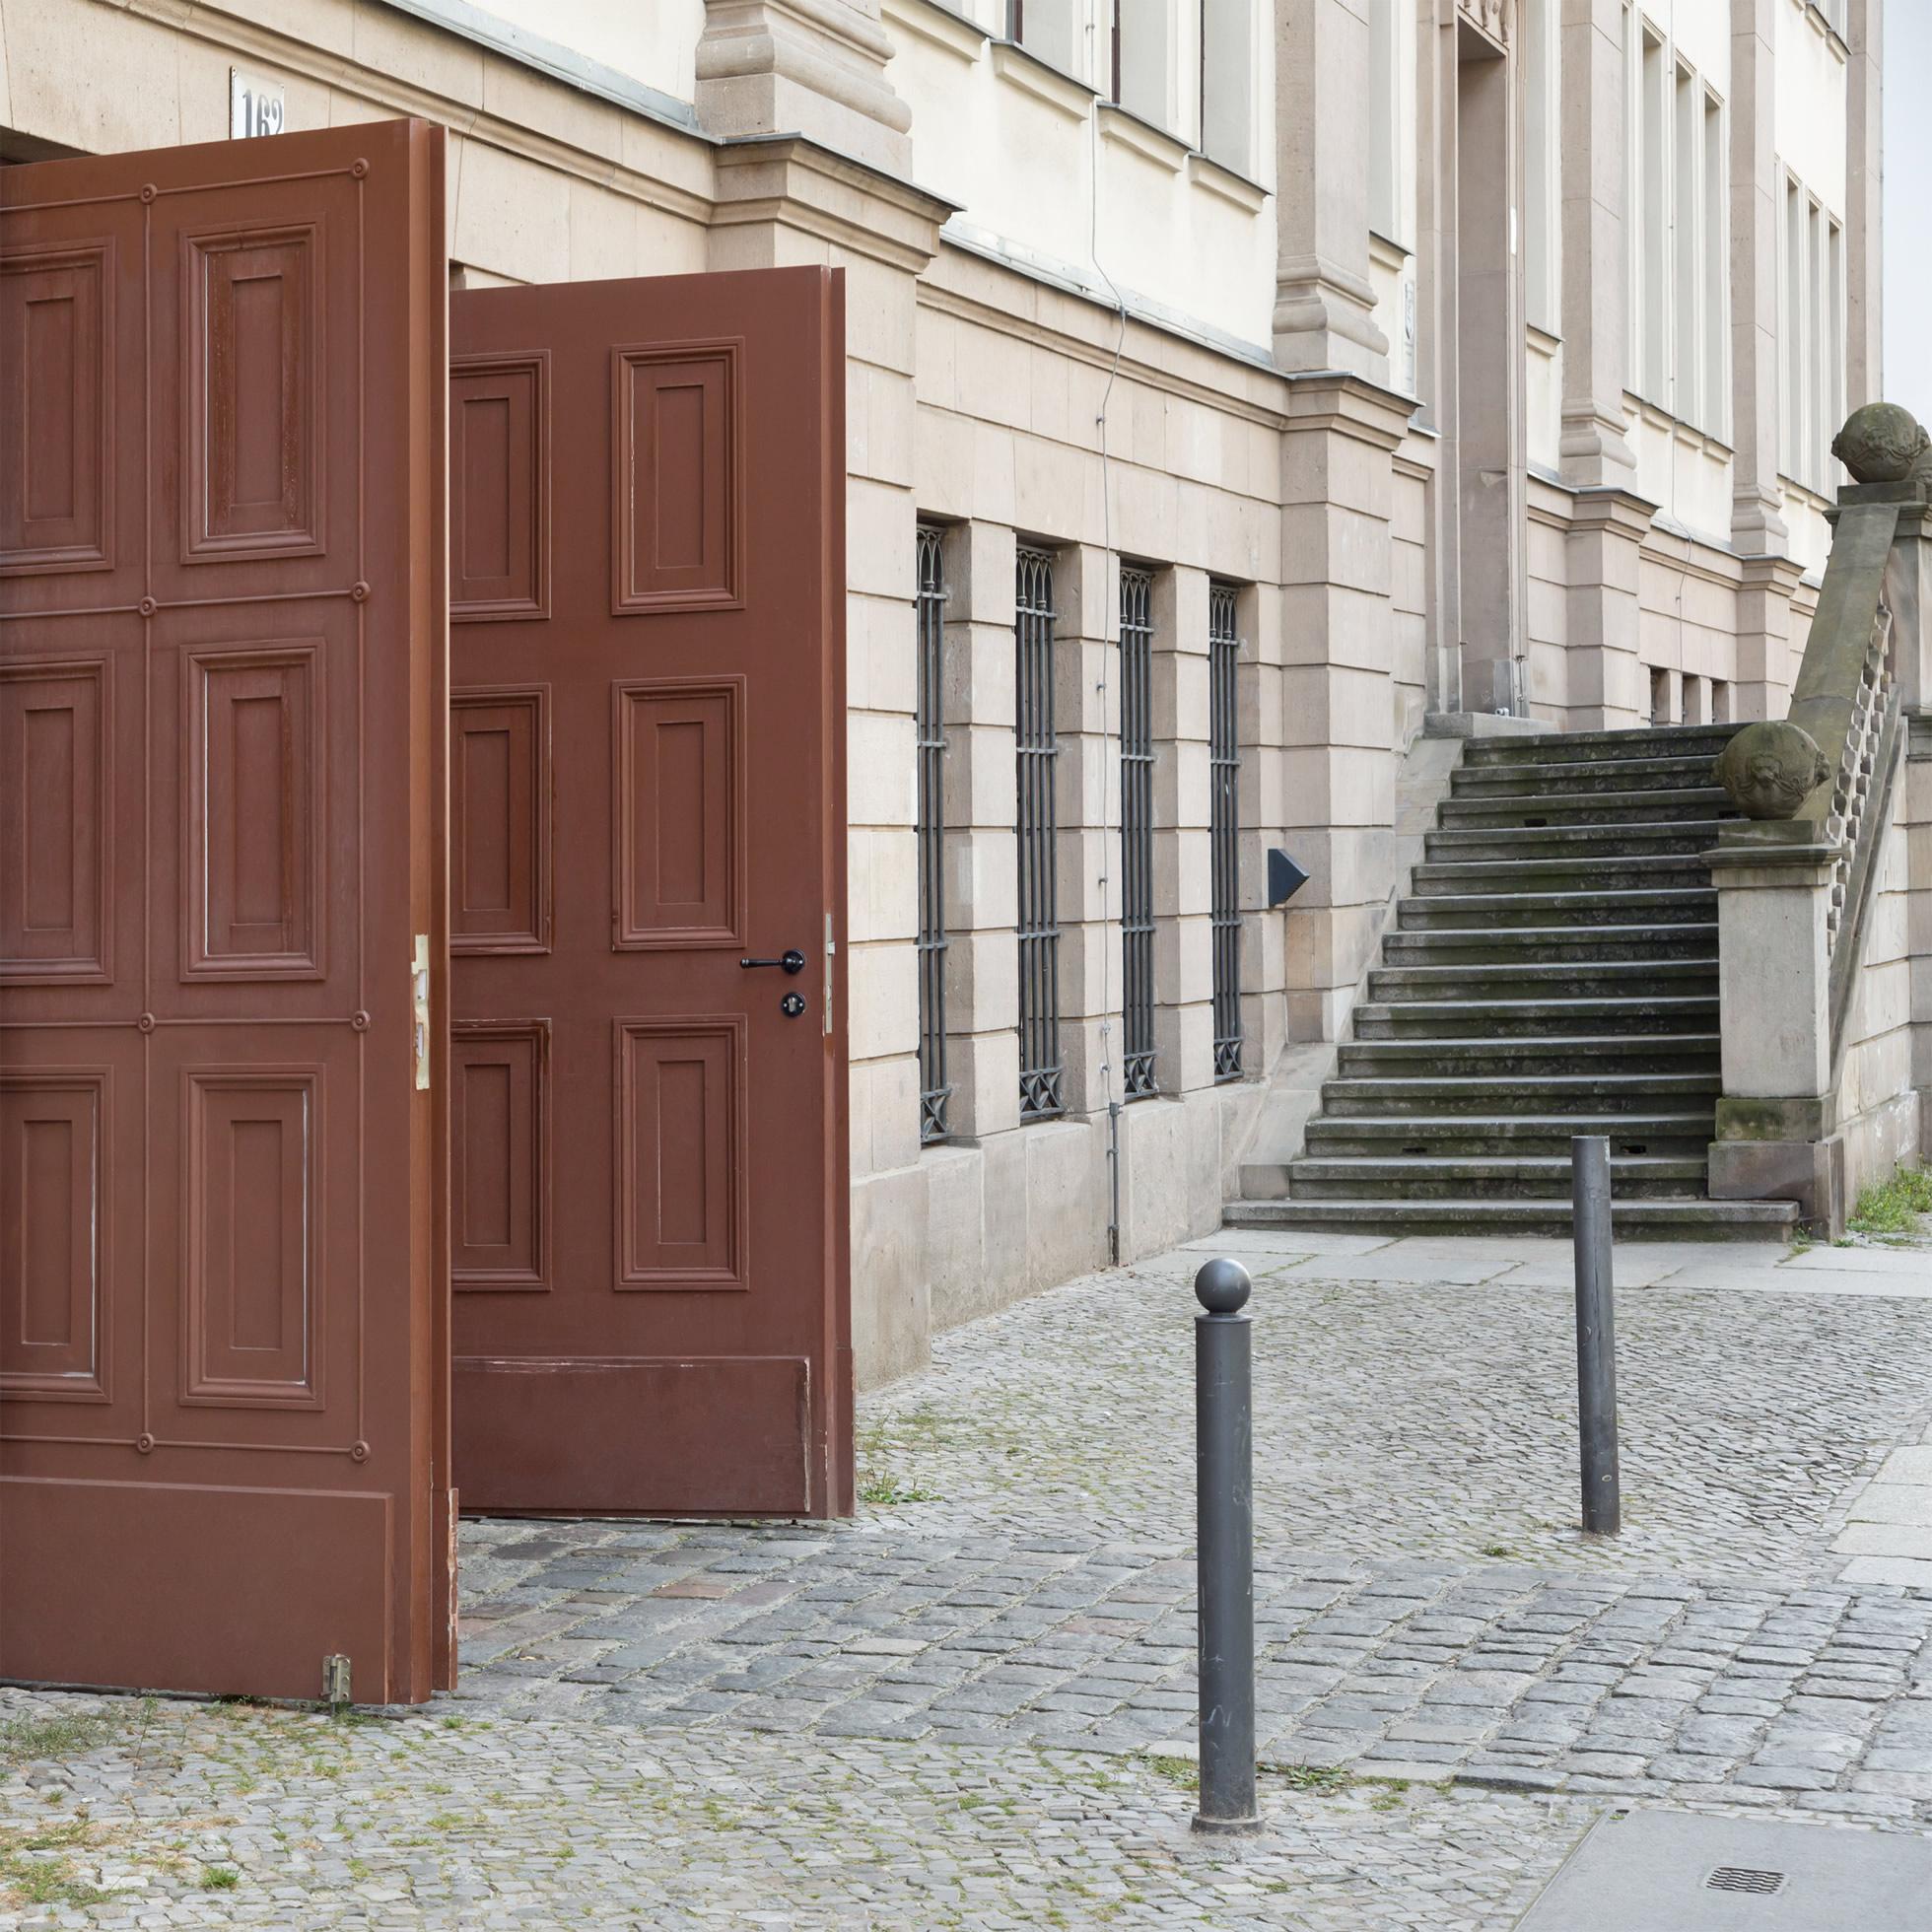 Juristische Beratung Immobilienrecht Maklerrecht Baurecht Werberecht Gewerblicher Rechtsschutz